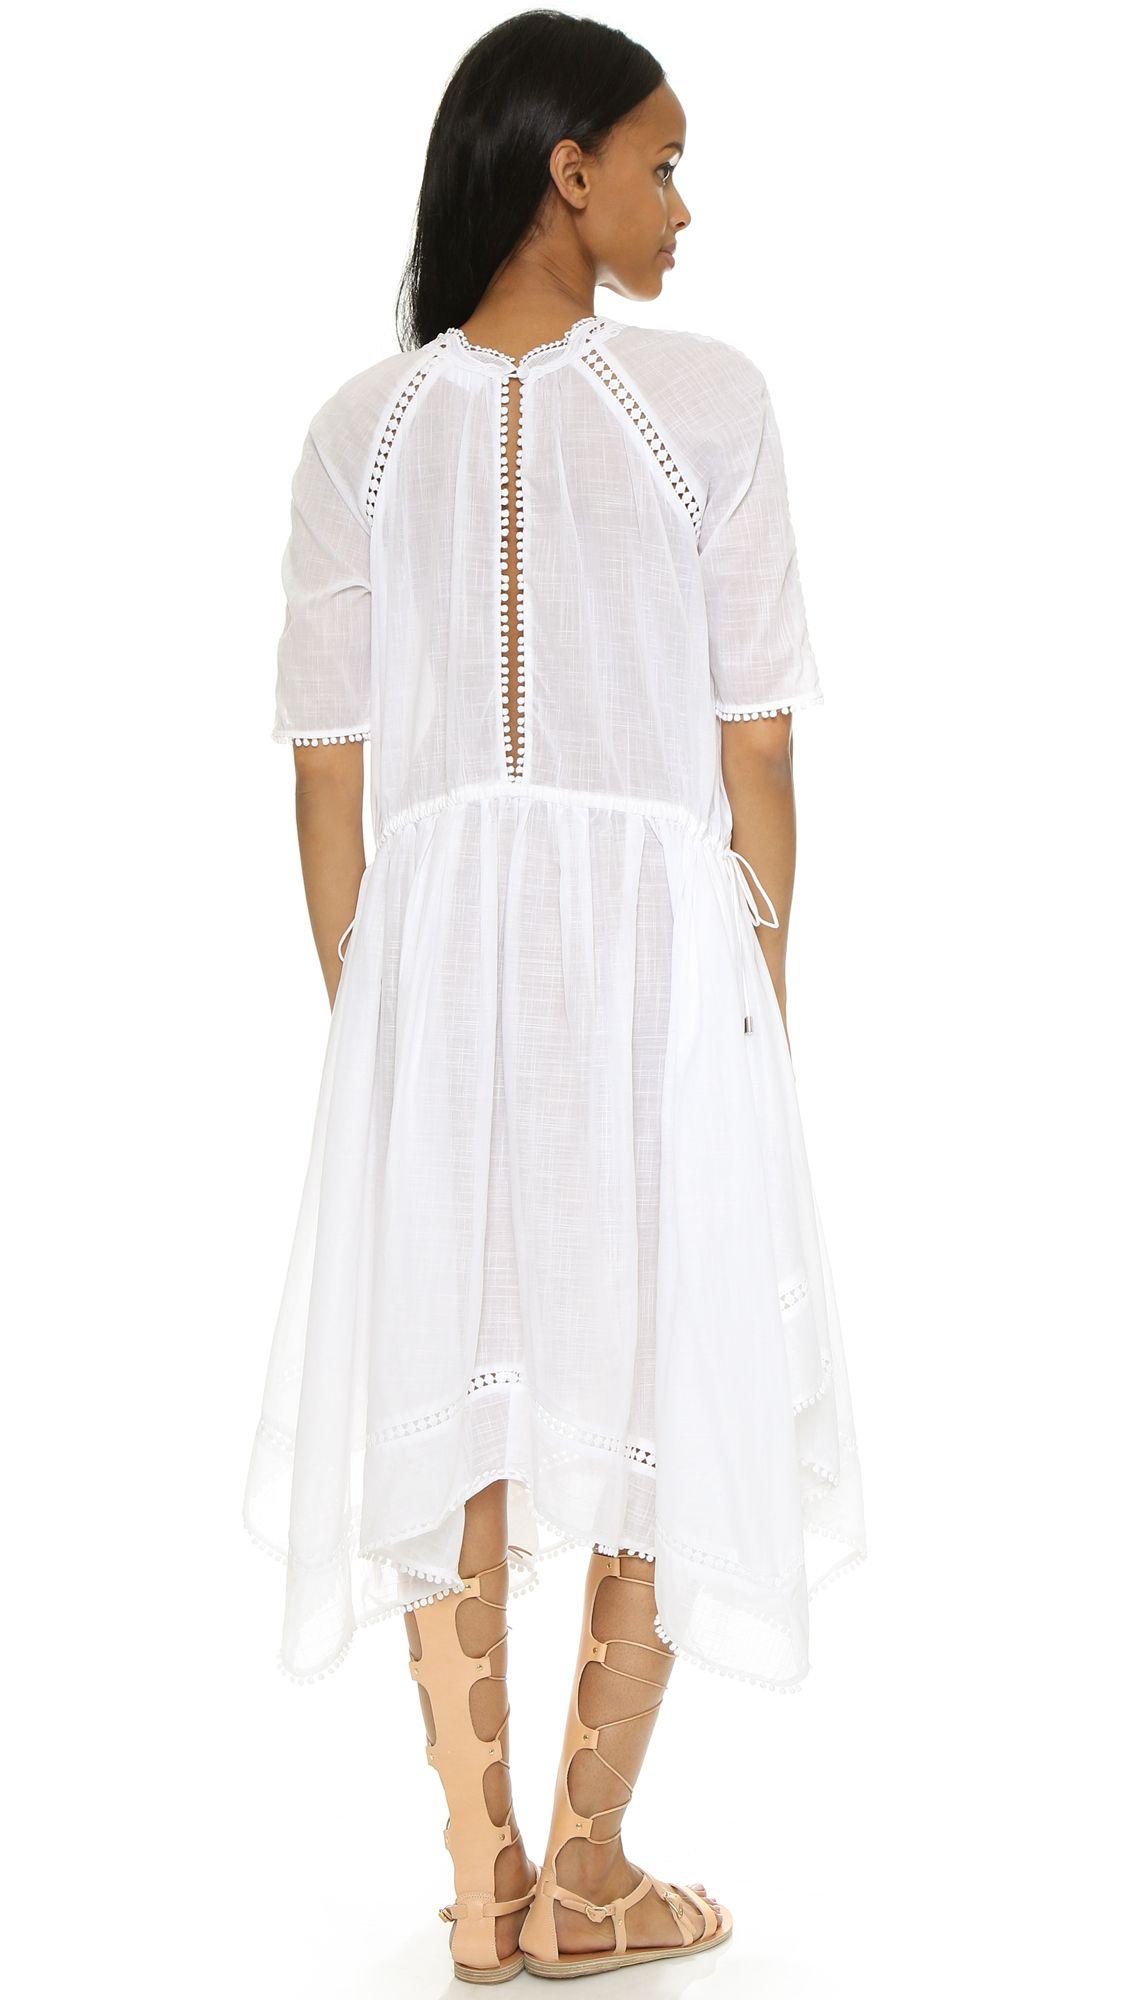 Silver pearl marisol white lace 1 - Marisol Motif Dress